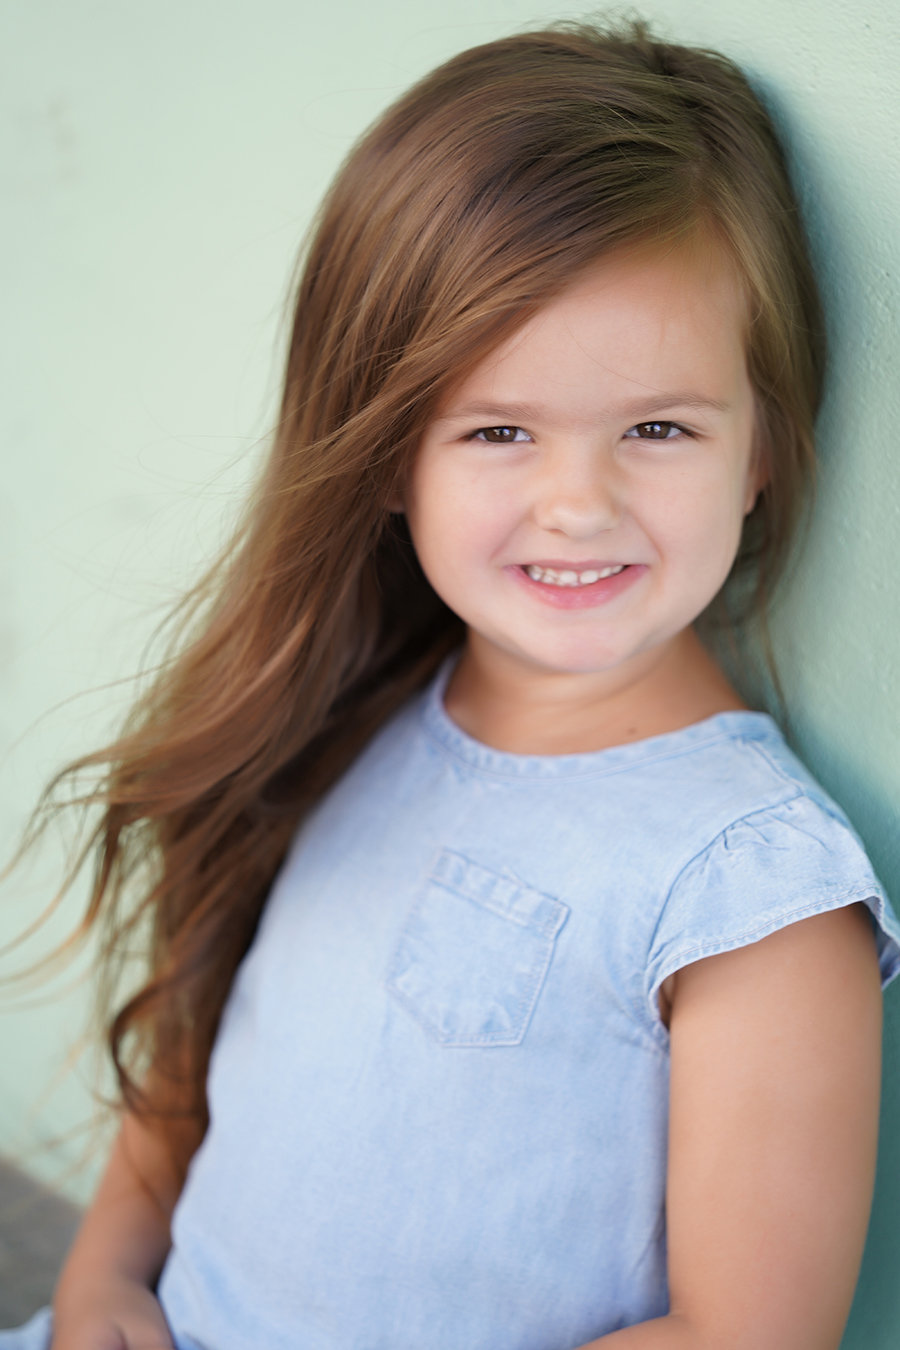 Kid's Modeling Headshots